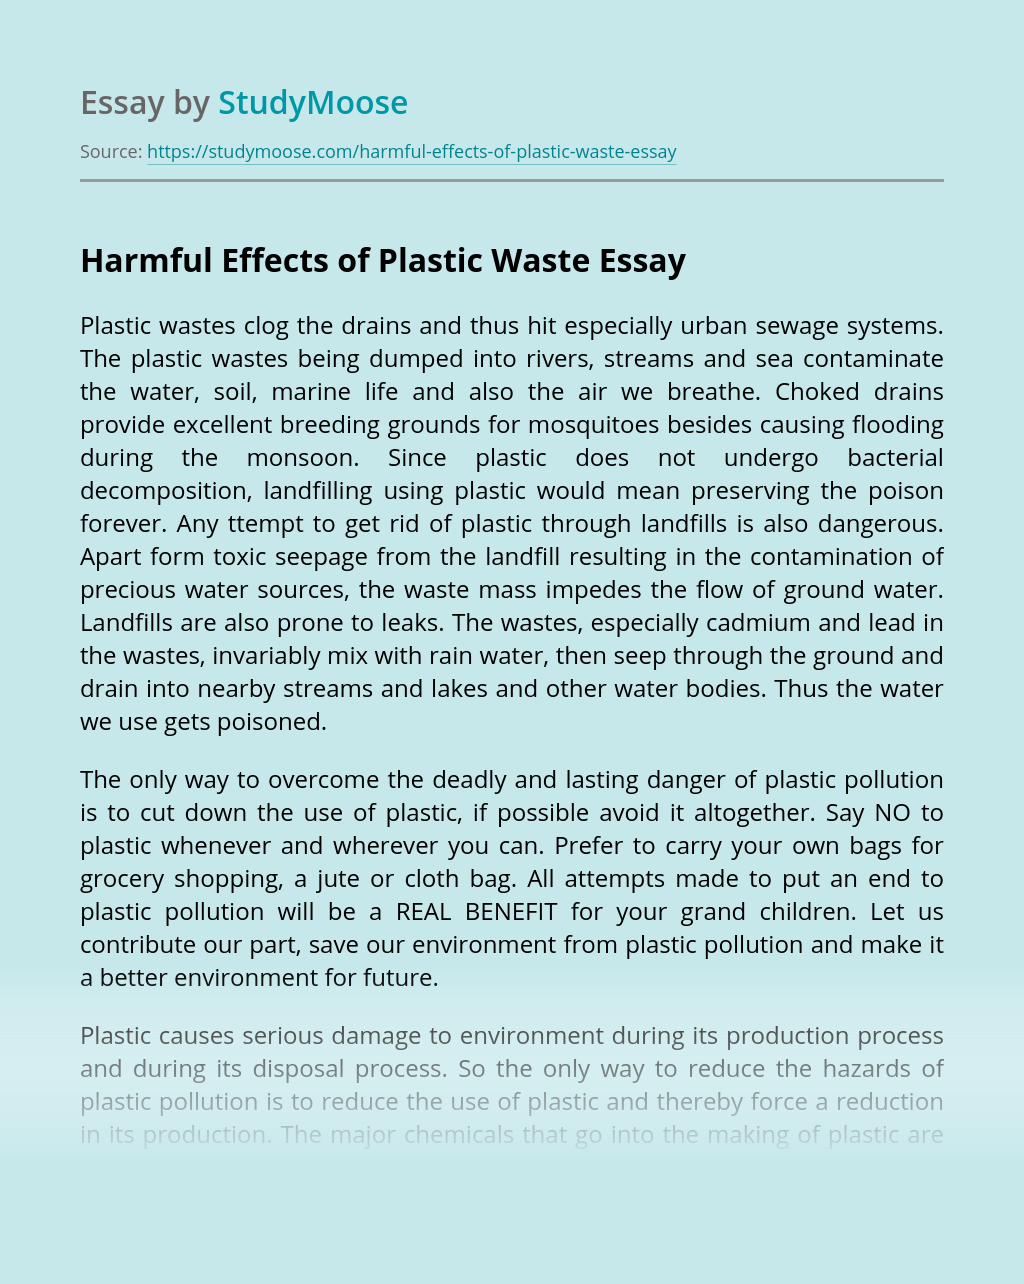 Harmful Effects of Plastic Waste